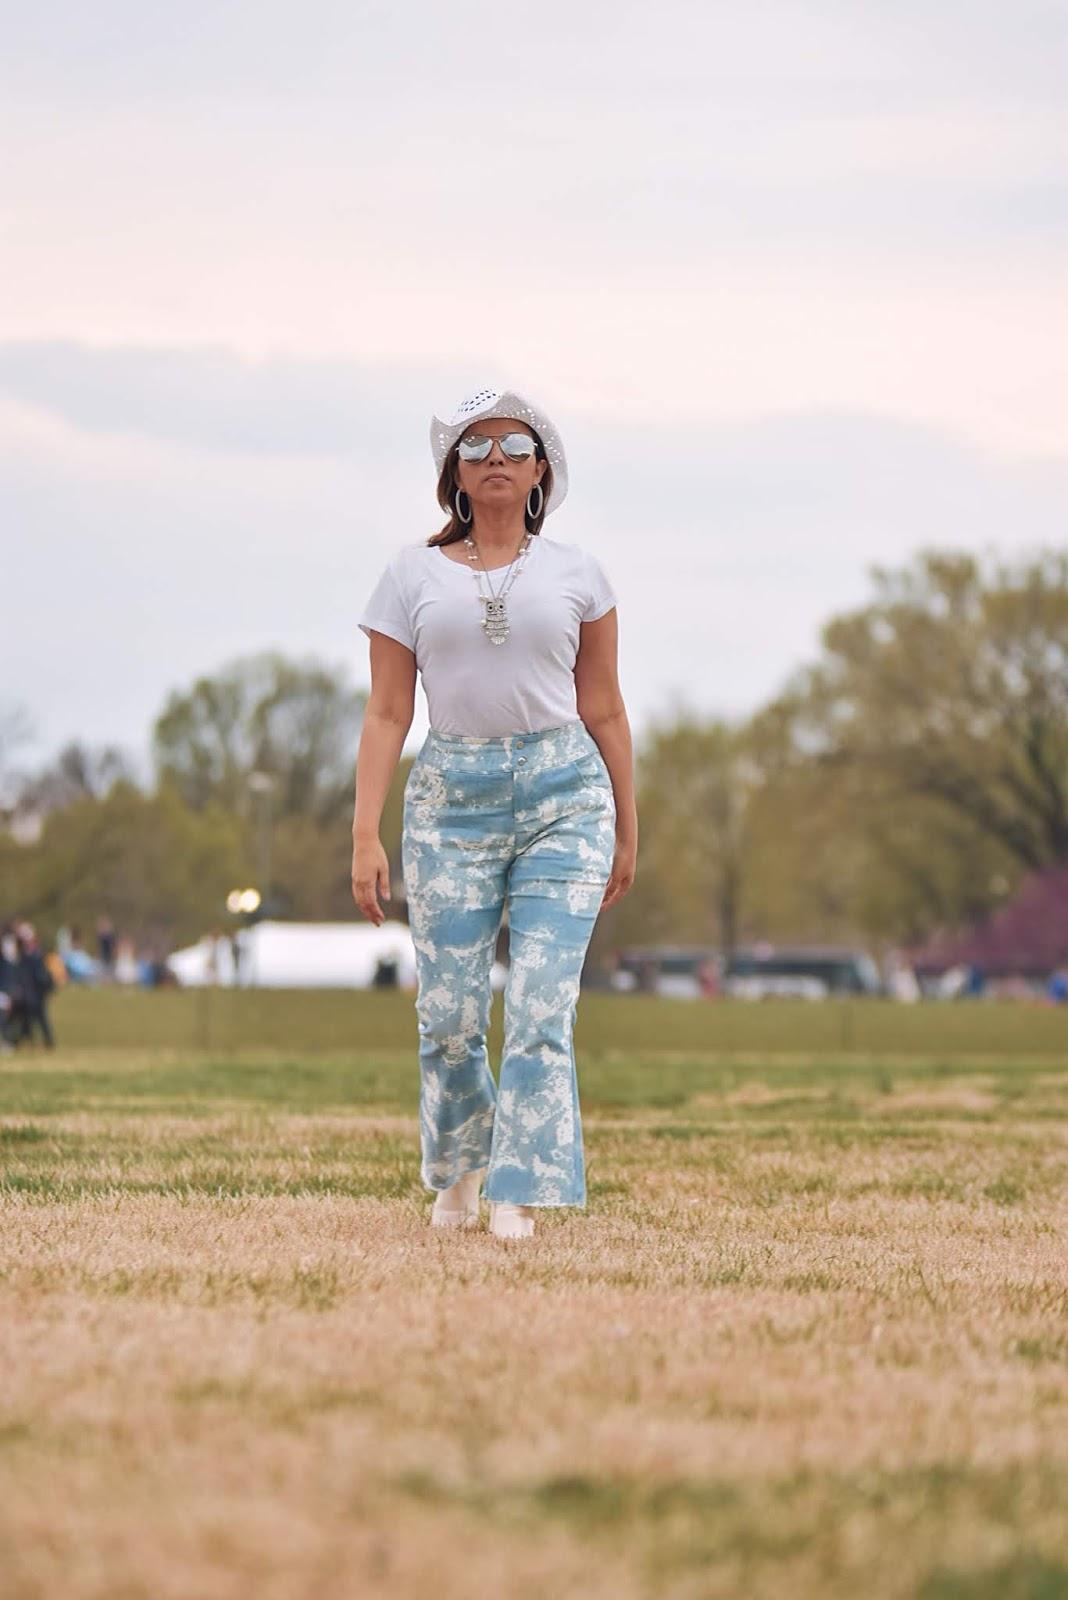 Tie Dye Flared Pants-MariEstilo-SheinFestival-coachella-coachella 2019-festival vibes-lookoftheday-dcblogger-fashionblogger-fashionista-modaelsalvador-modamexico-cowboy style-cowboy girl-